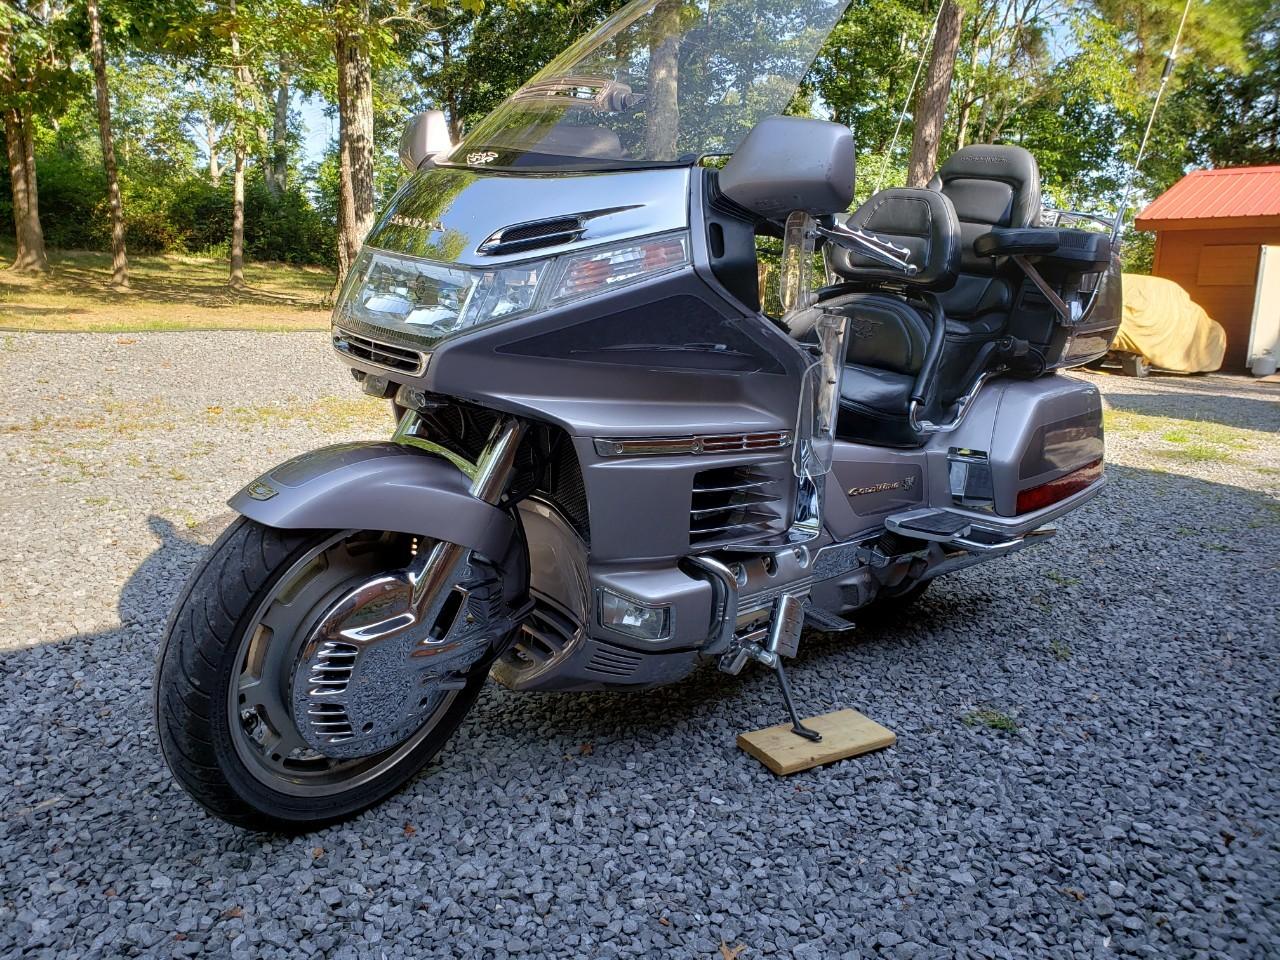 Honda For Sale - Honda Motorcycle,Trailers - Snowmobile Trader